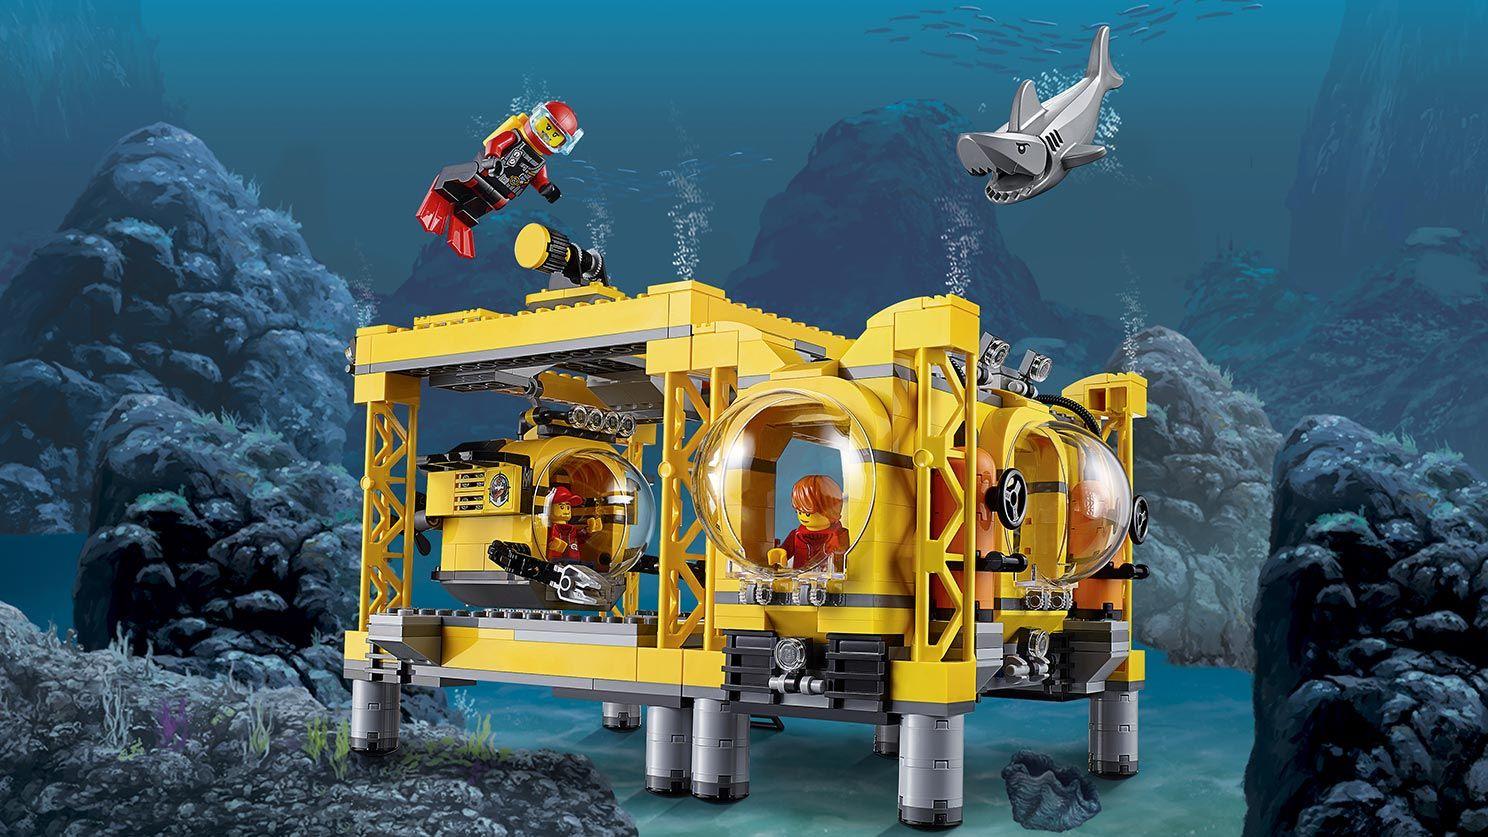 Lego City Deep Sea Base Shark And Explorer Minifigures Deep Sea Operation Base 60096 Lego Design Lego City Lego Activities